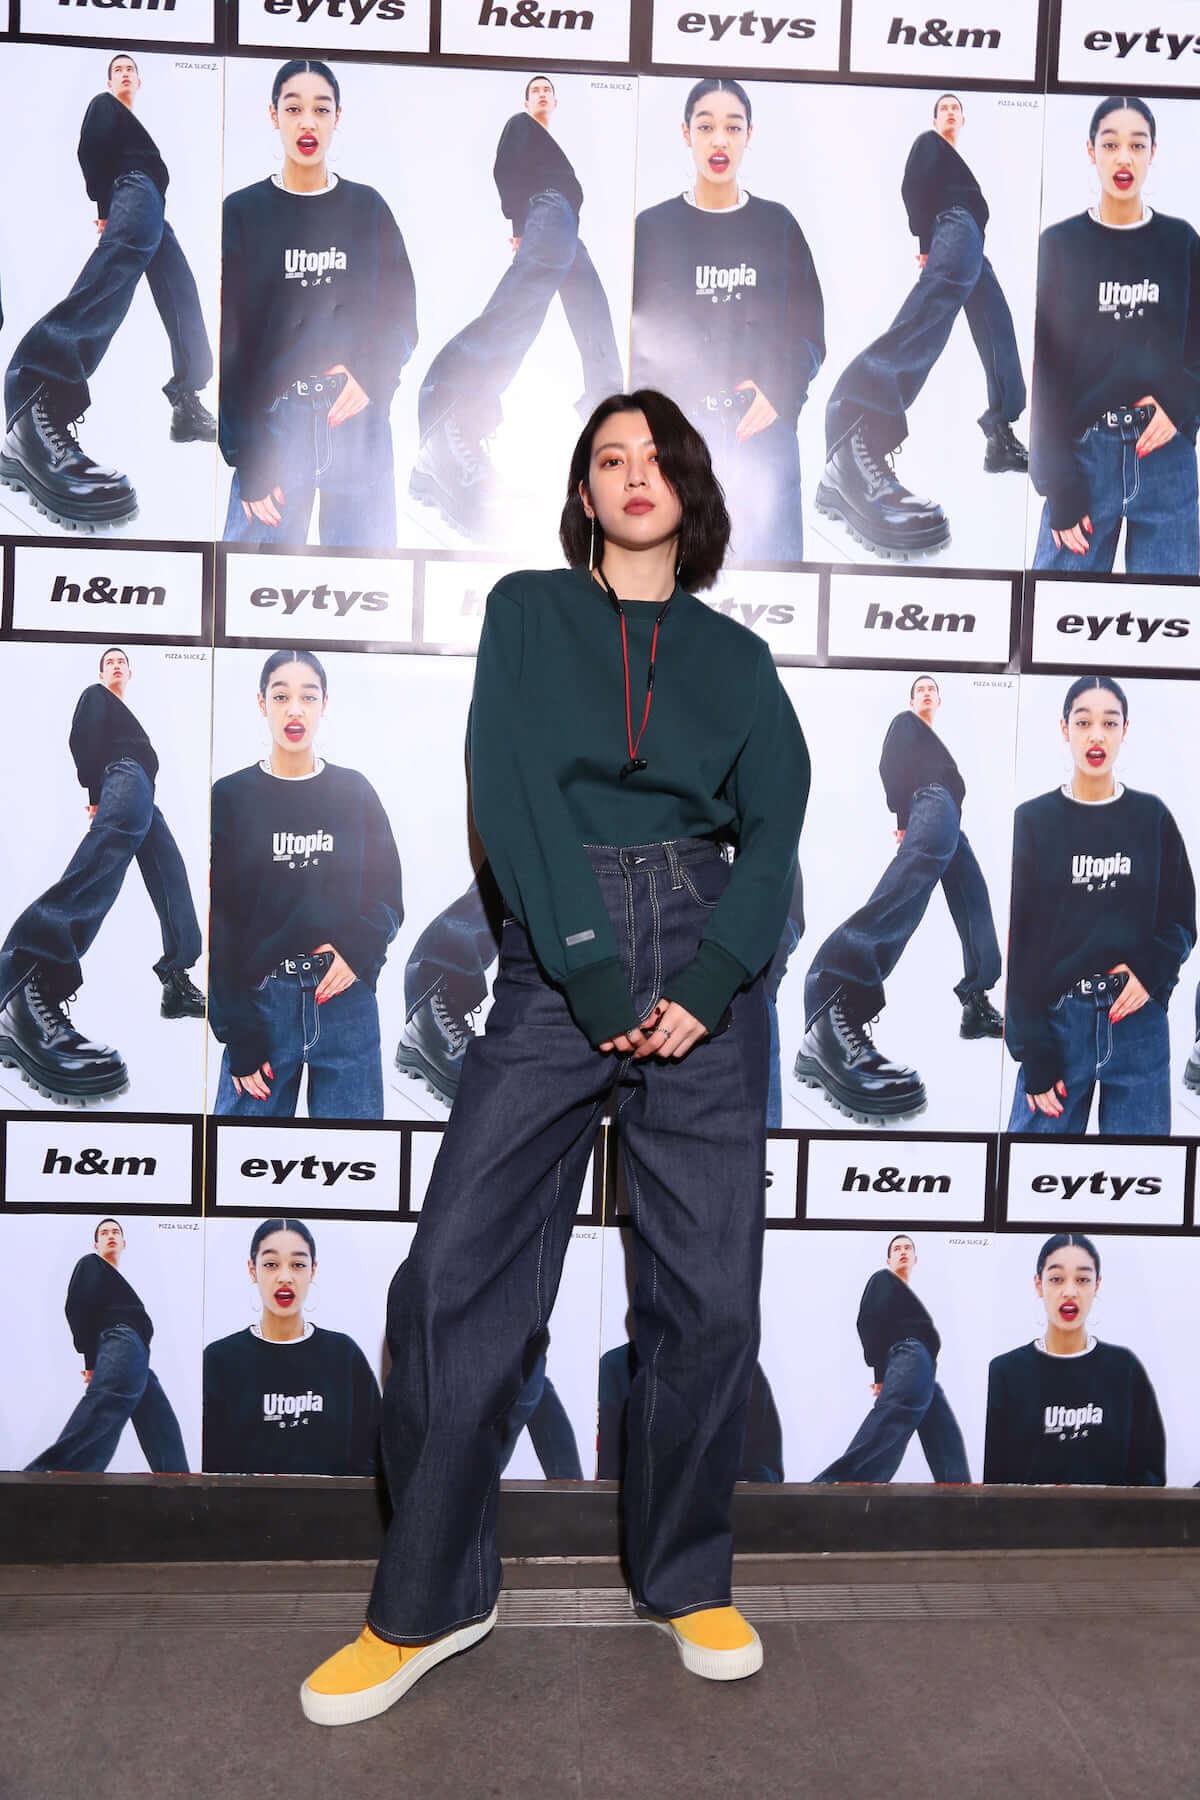 Eytys×H&Mのコラボコレクションが本日より発売開始 life-fashion190124-hm-eytys-2-1200x1800